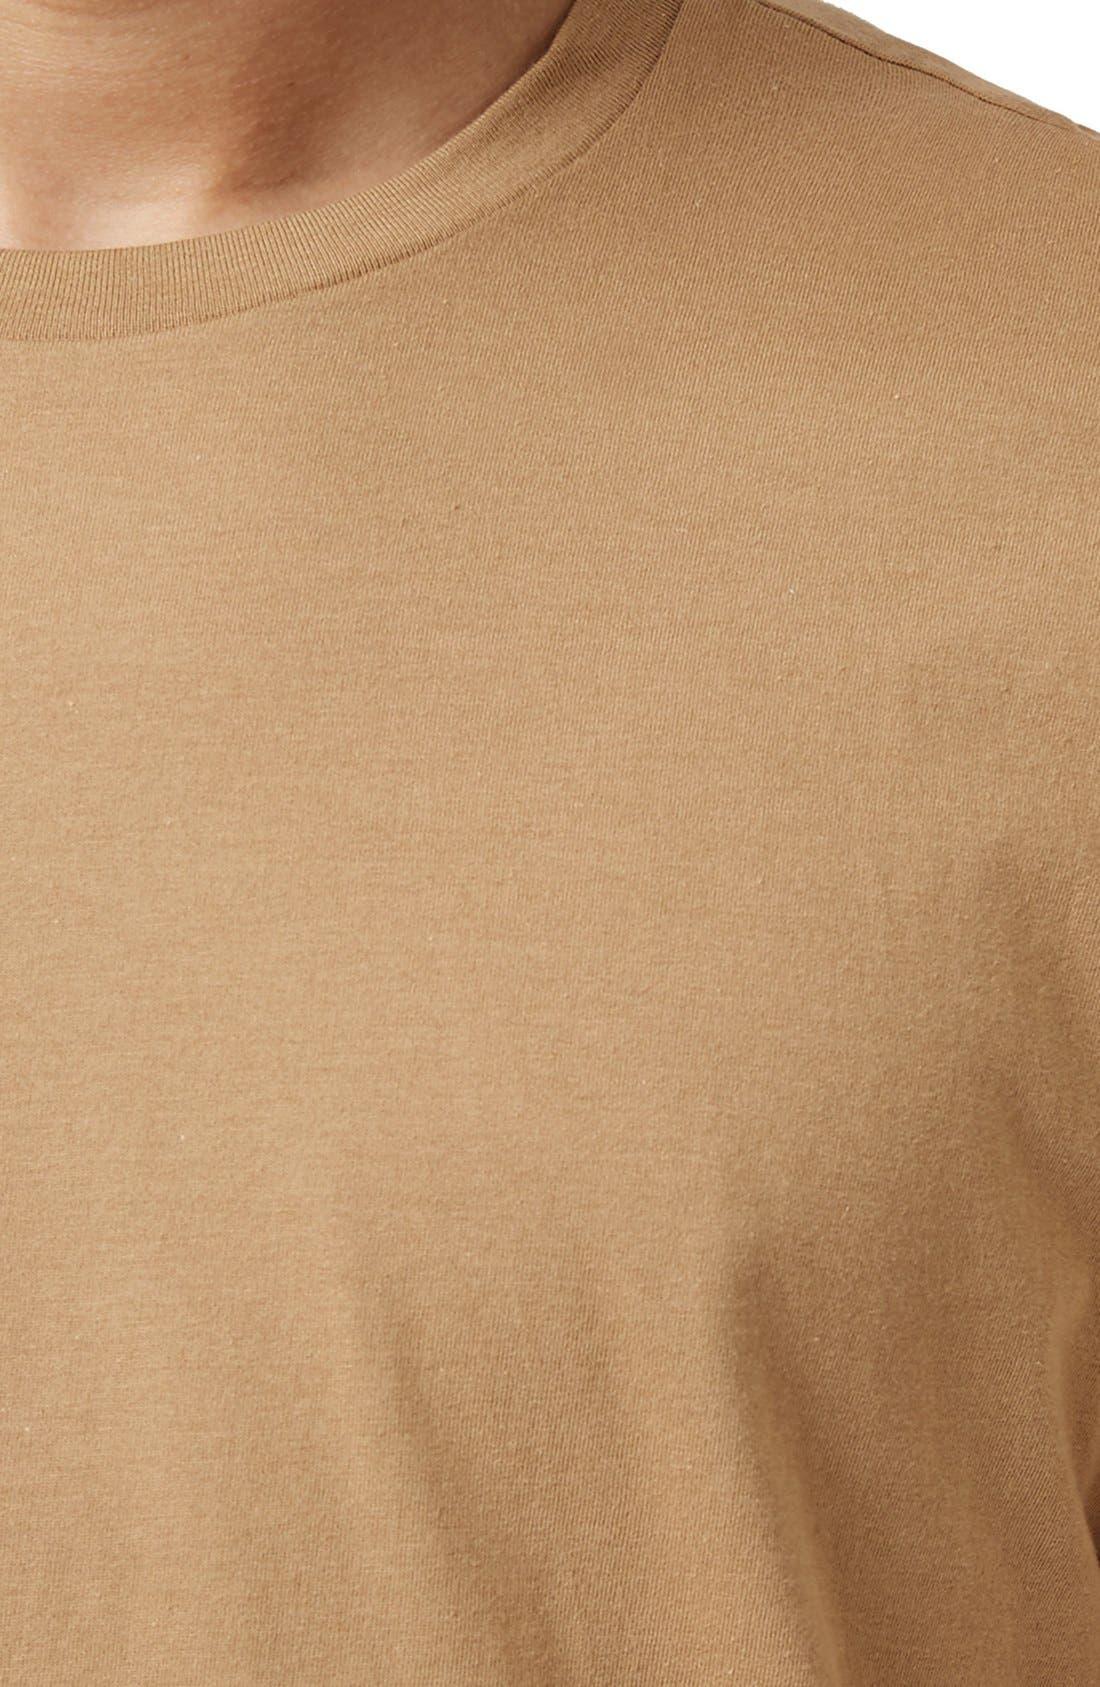 Slim Fit Crewneck T-Shirt,                             Alternate thumbnail 326, color,